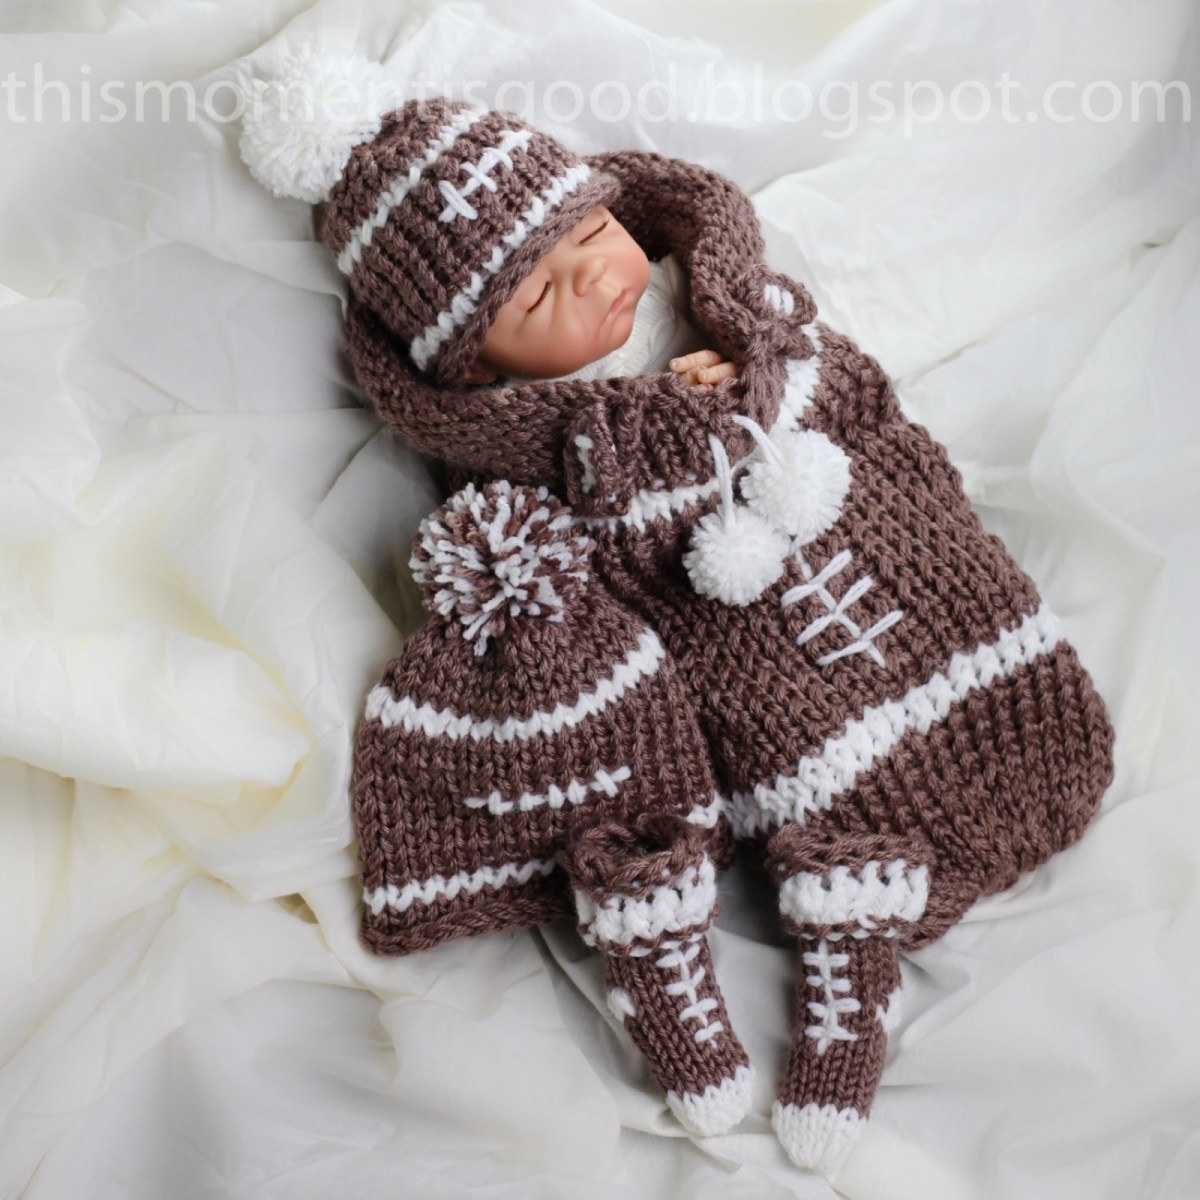 Crochet Cocoon Patterns For Newborns Loom Knit Newborn Cocoon Pattern Loom Knit Hat Pattern Loom Knit